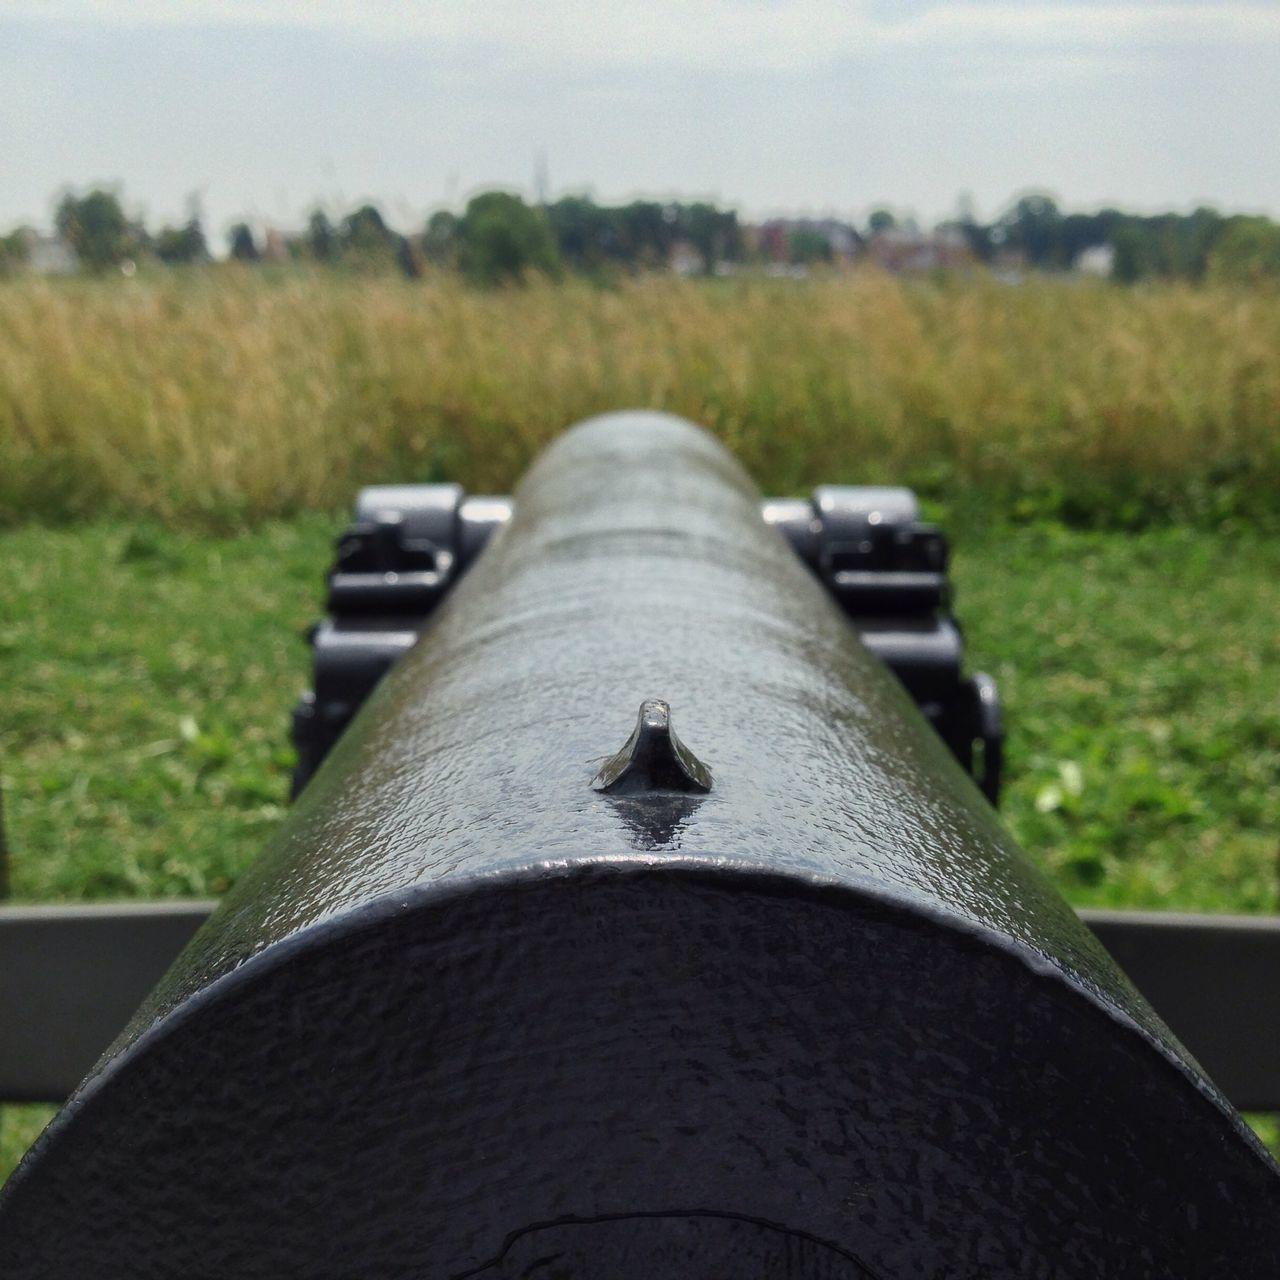 Close up of metalic barrel in nature